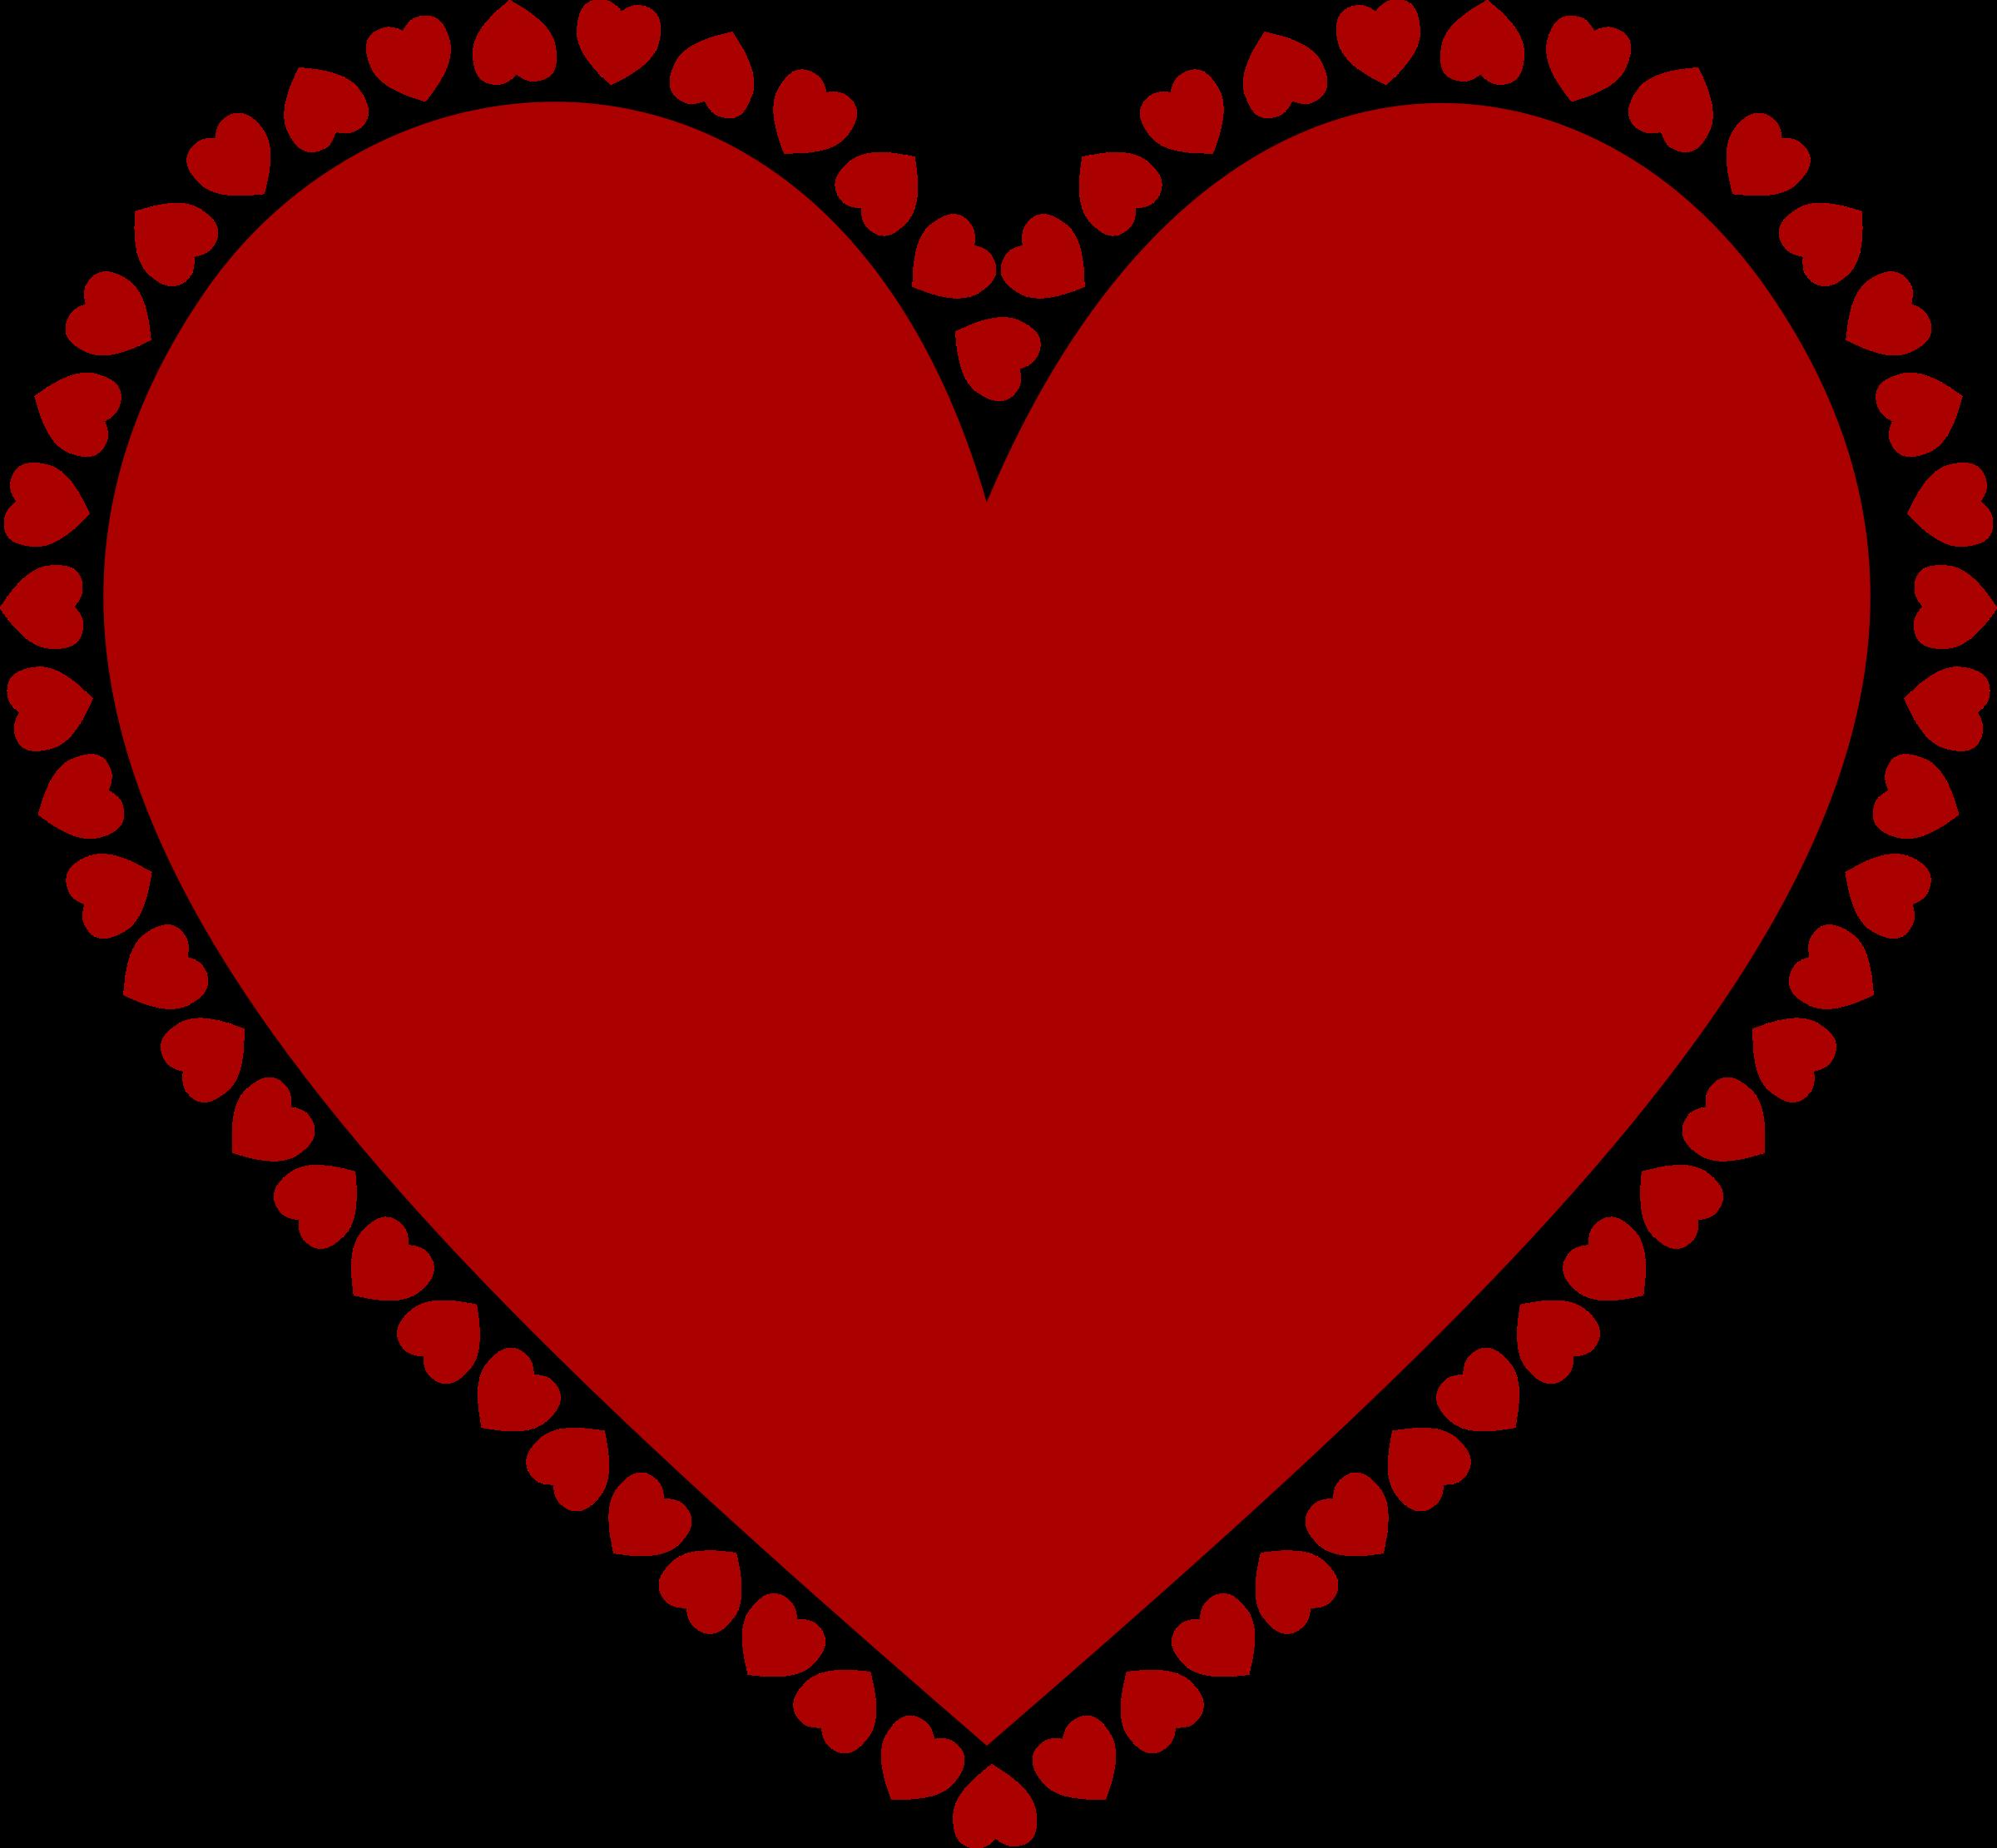 Heart PNG HD  - 124408